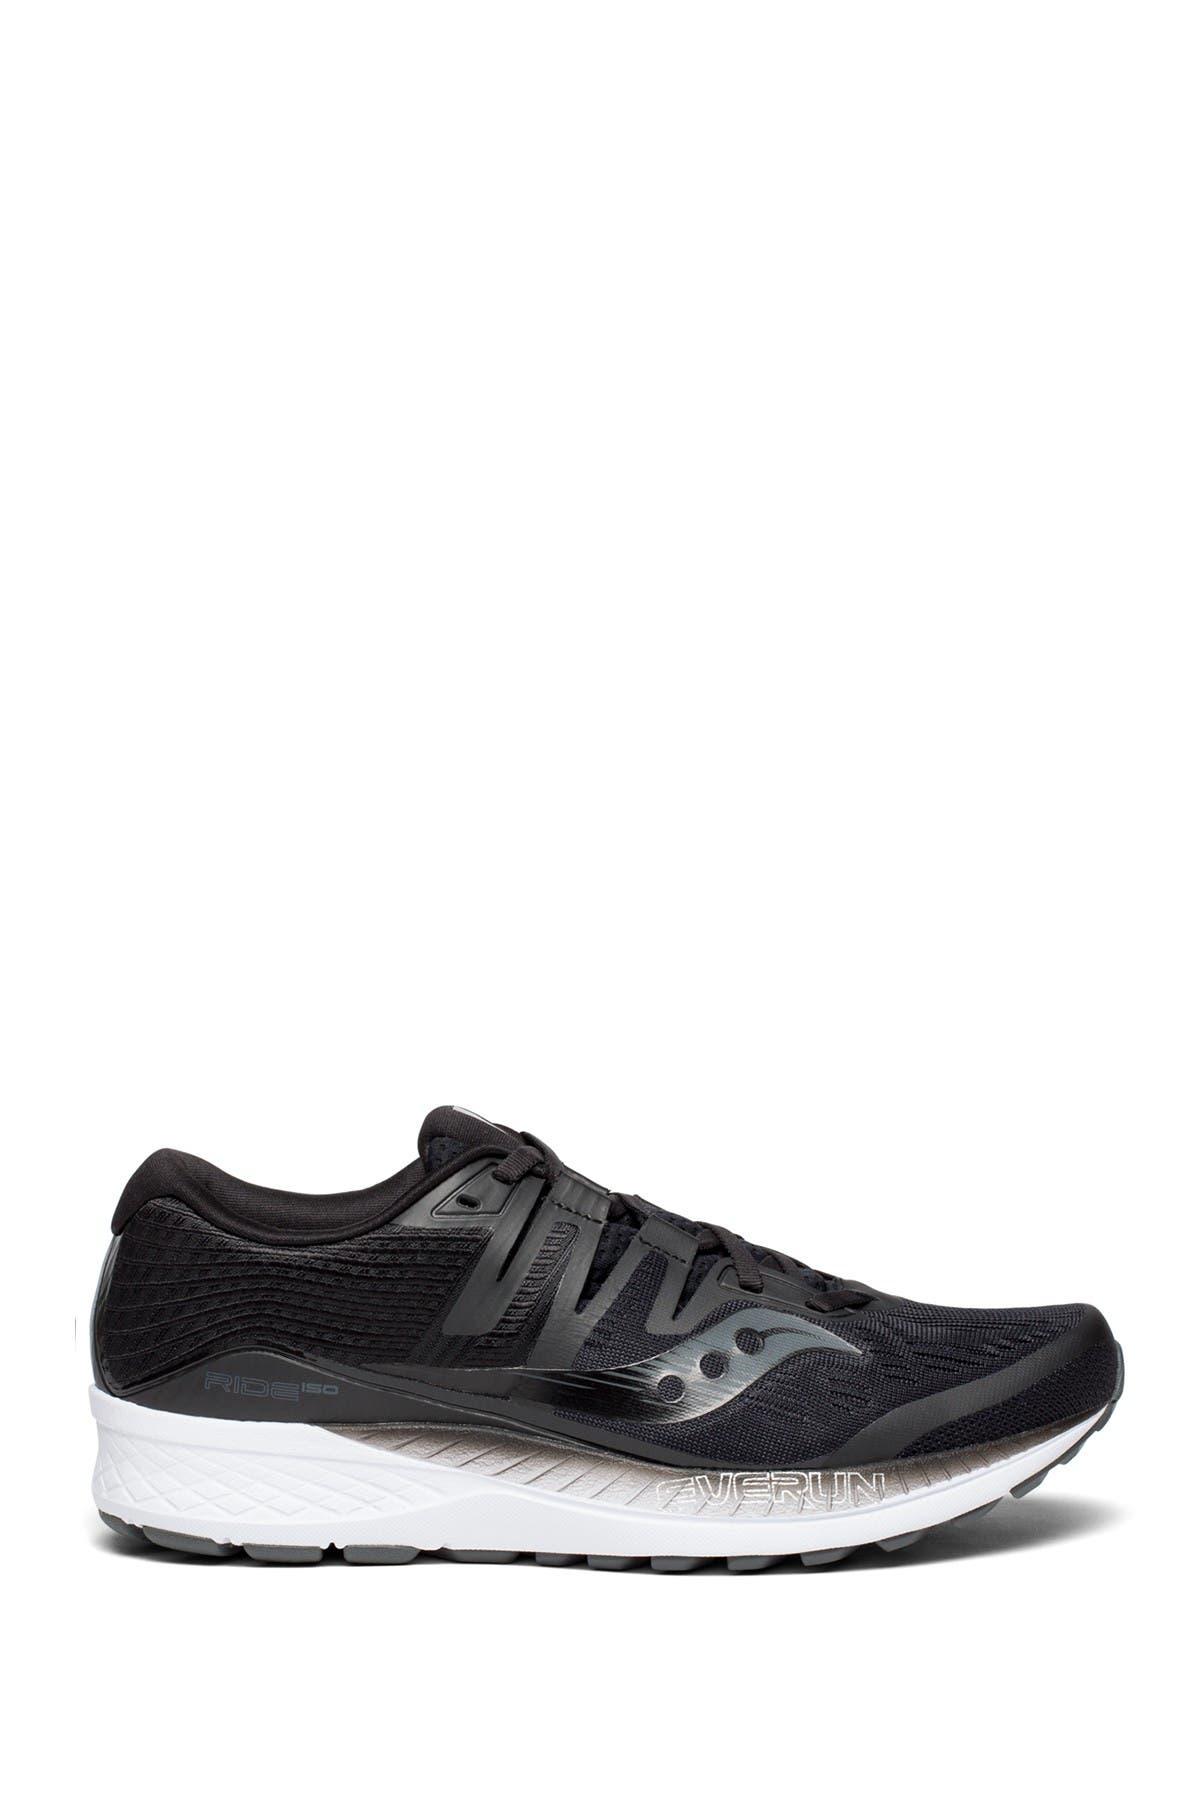 Saucony | Ride ISO Running Shoe - Wide